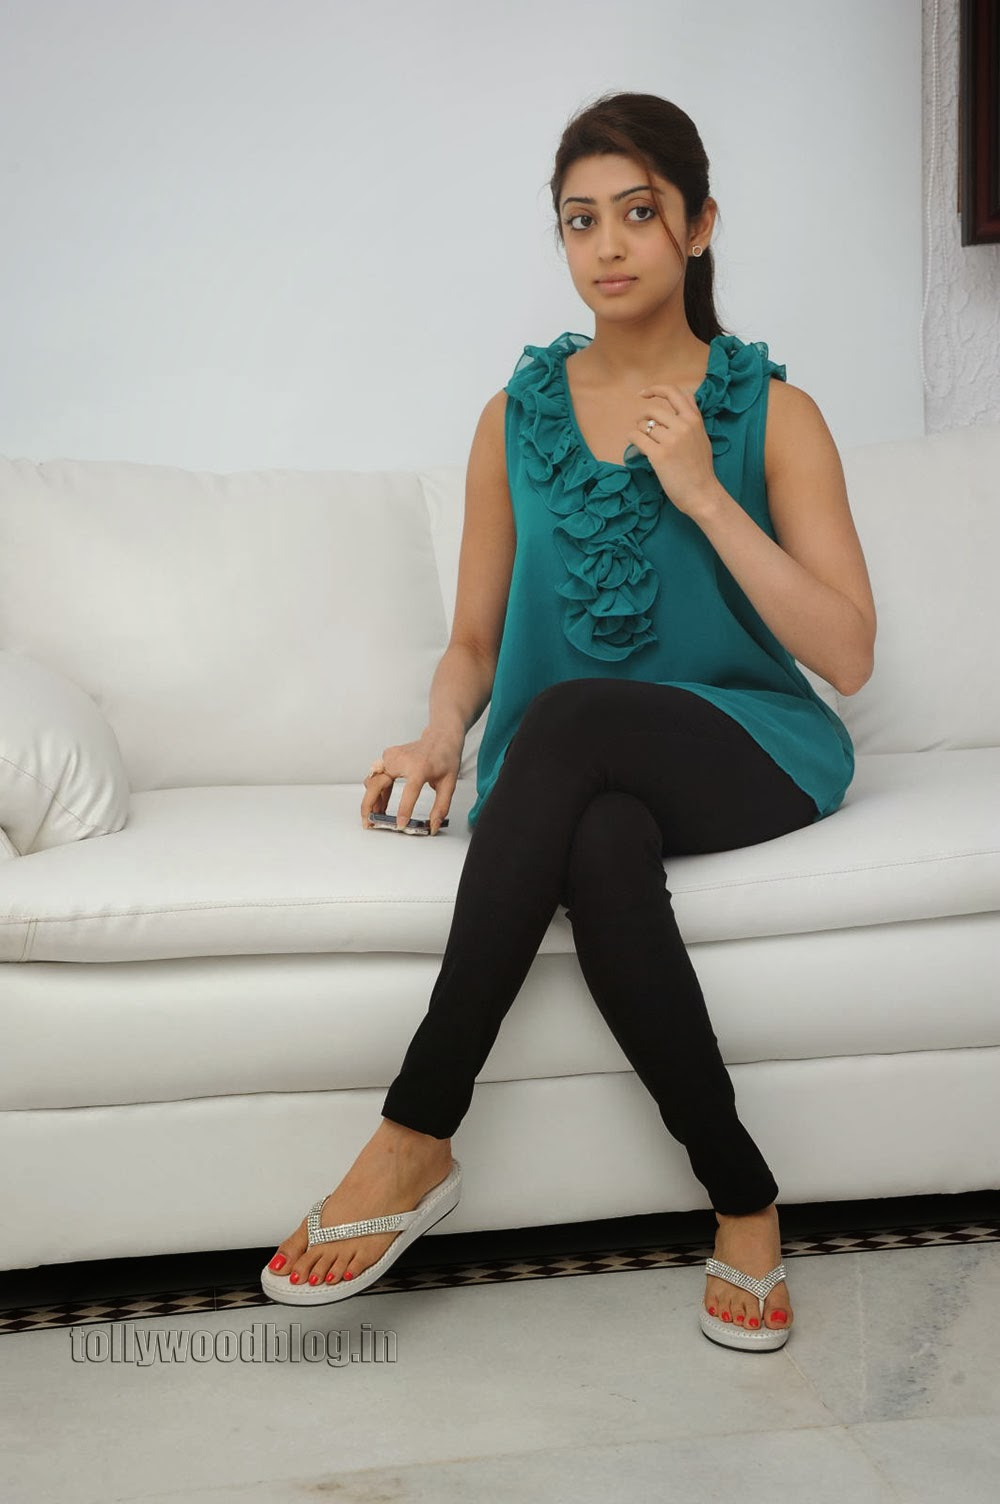 Desi Girl Wallpaper Bollywood Actress Country Prism